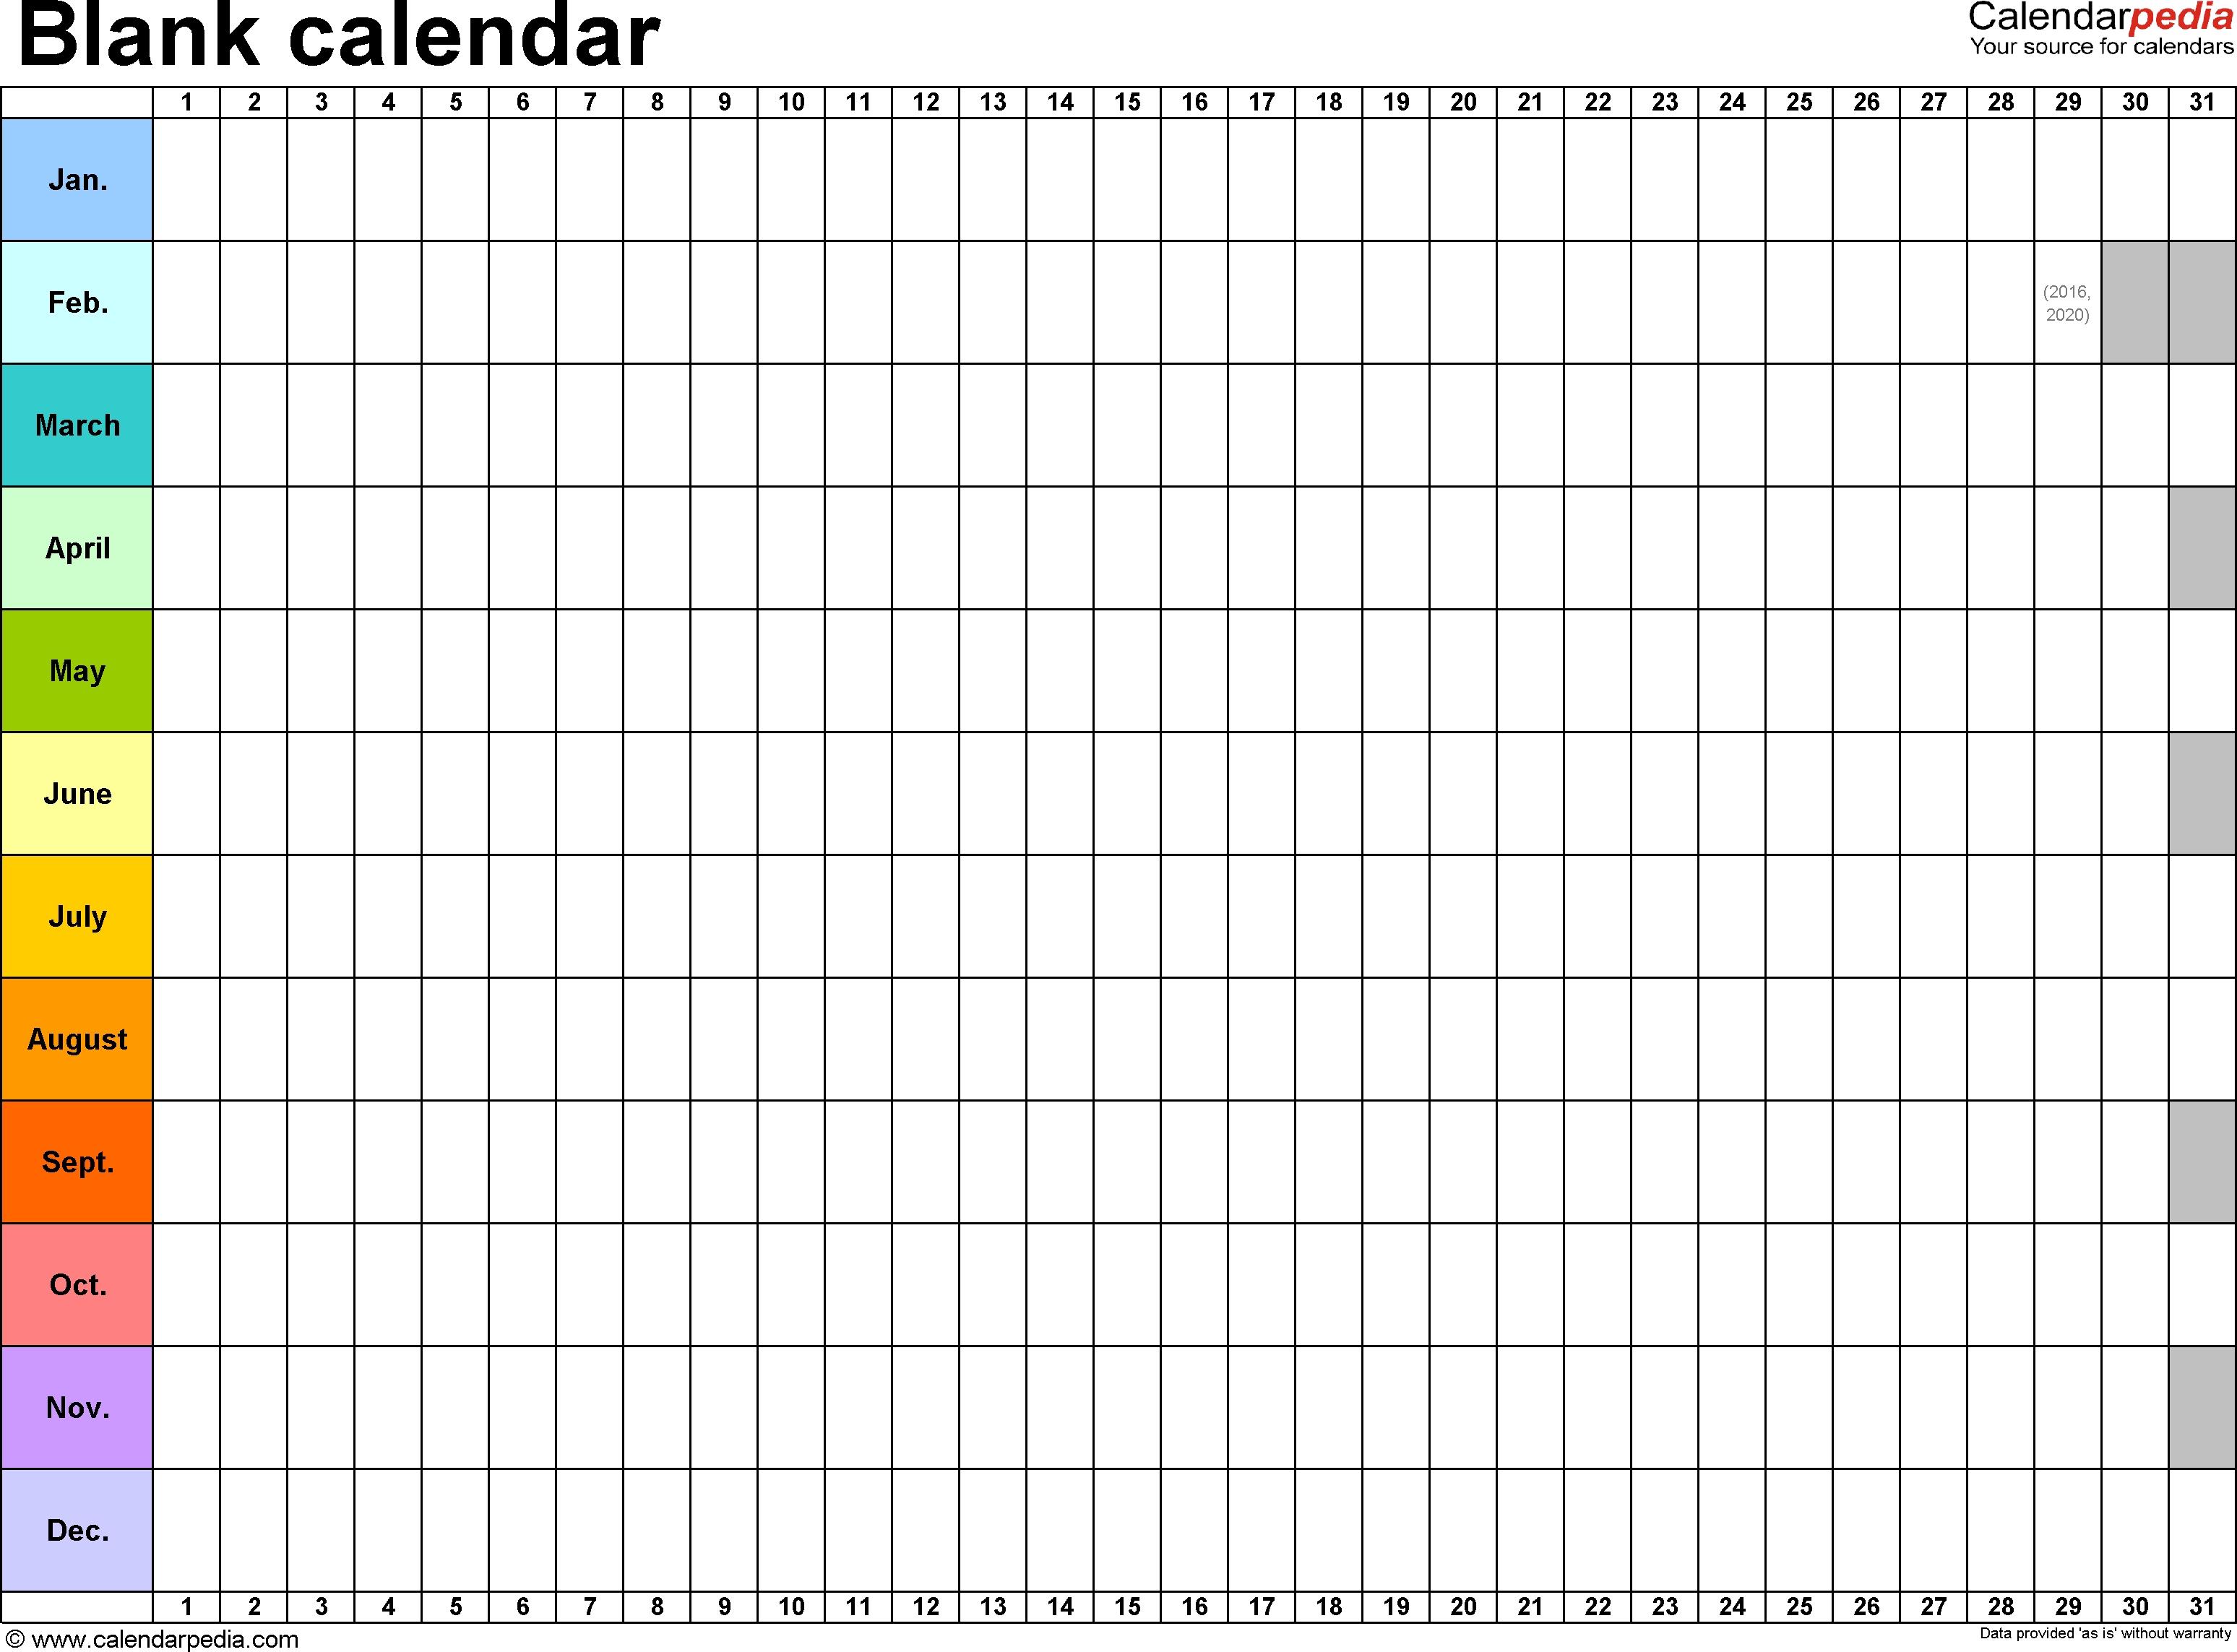 Blank Calendar - 9 Free Printable Microsoft Word Templates  Blank 30 Day Calendar Template